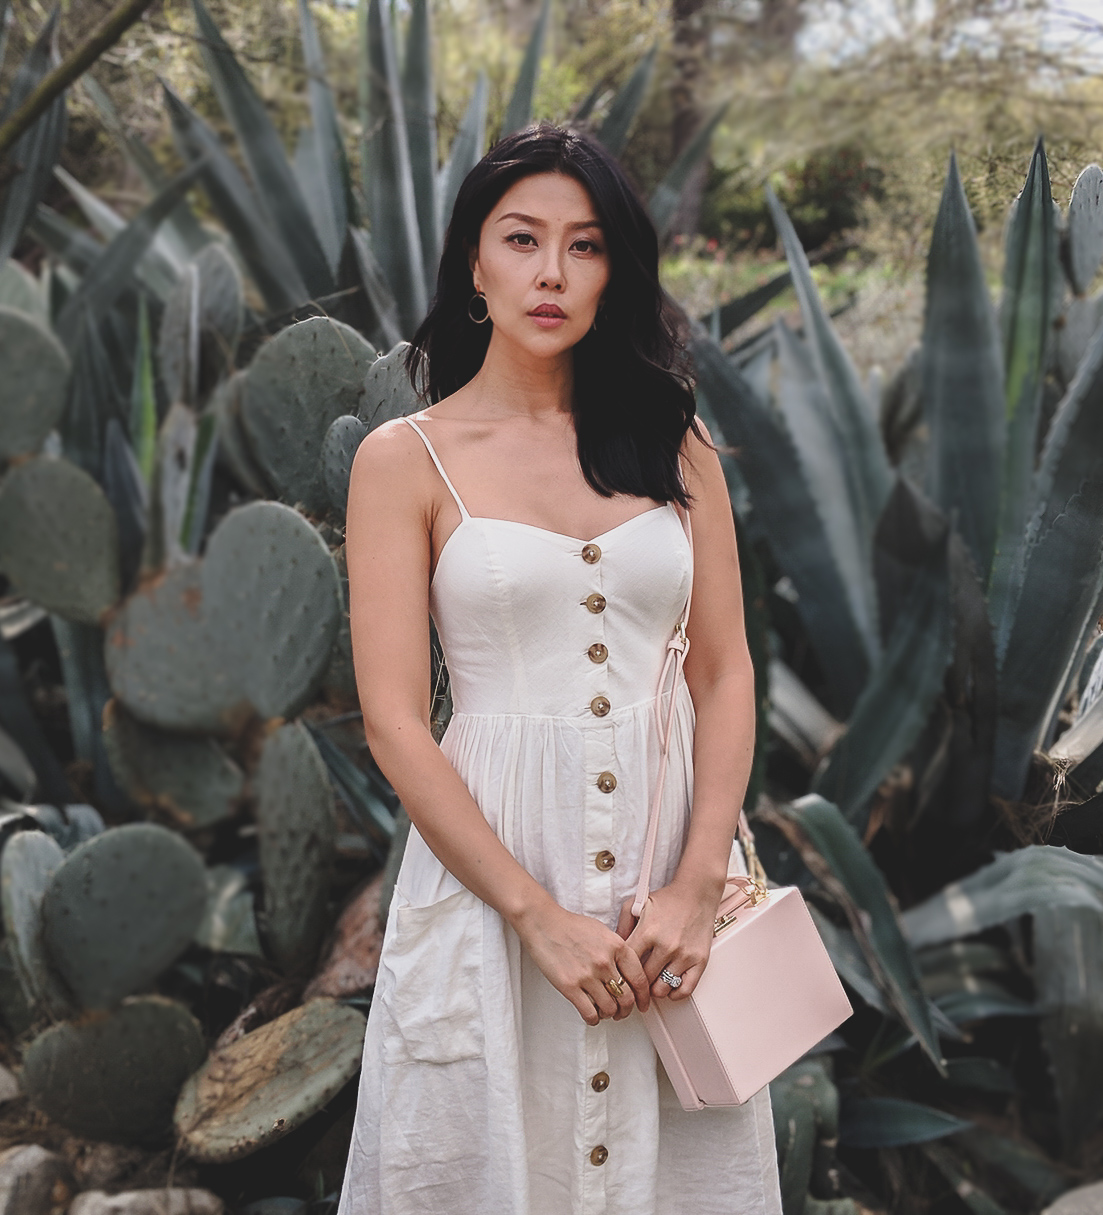 white button dress summer outfit idea